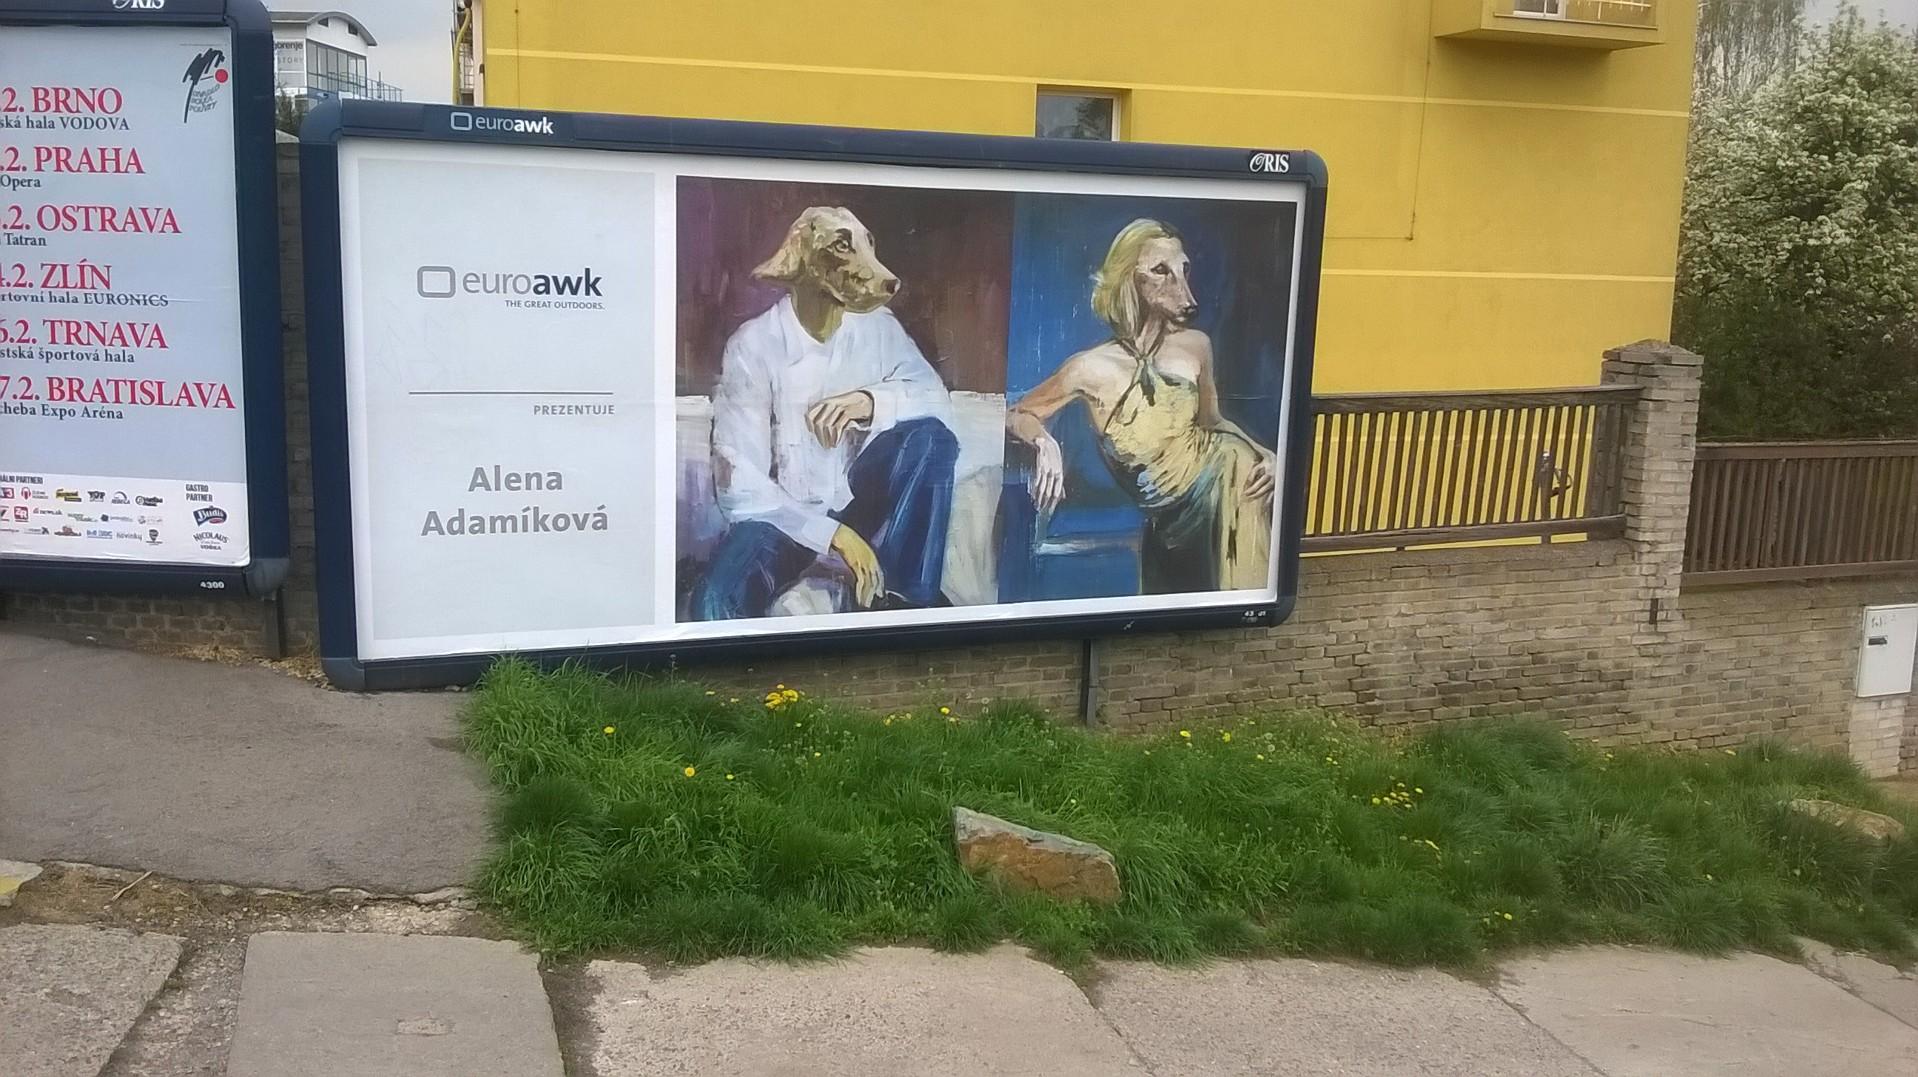 euroawk alena adamikova poster billboard